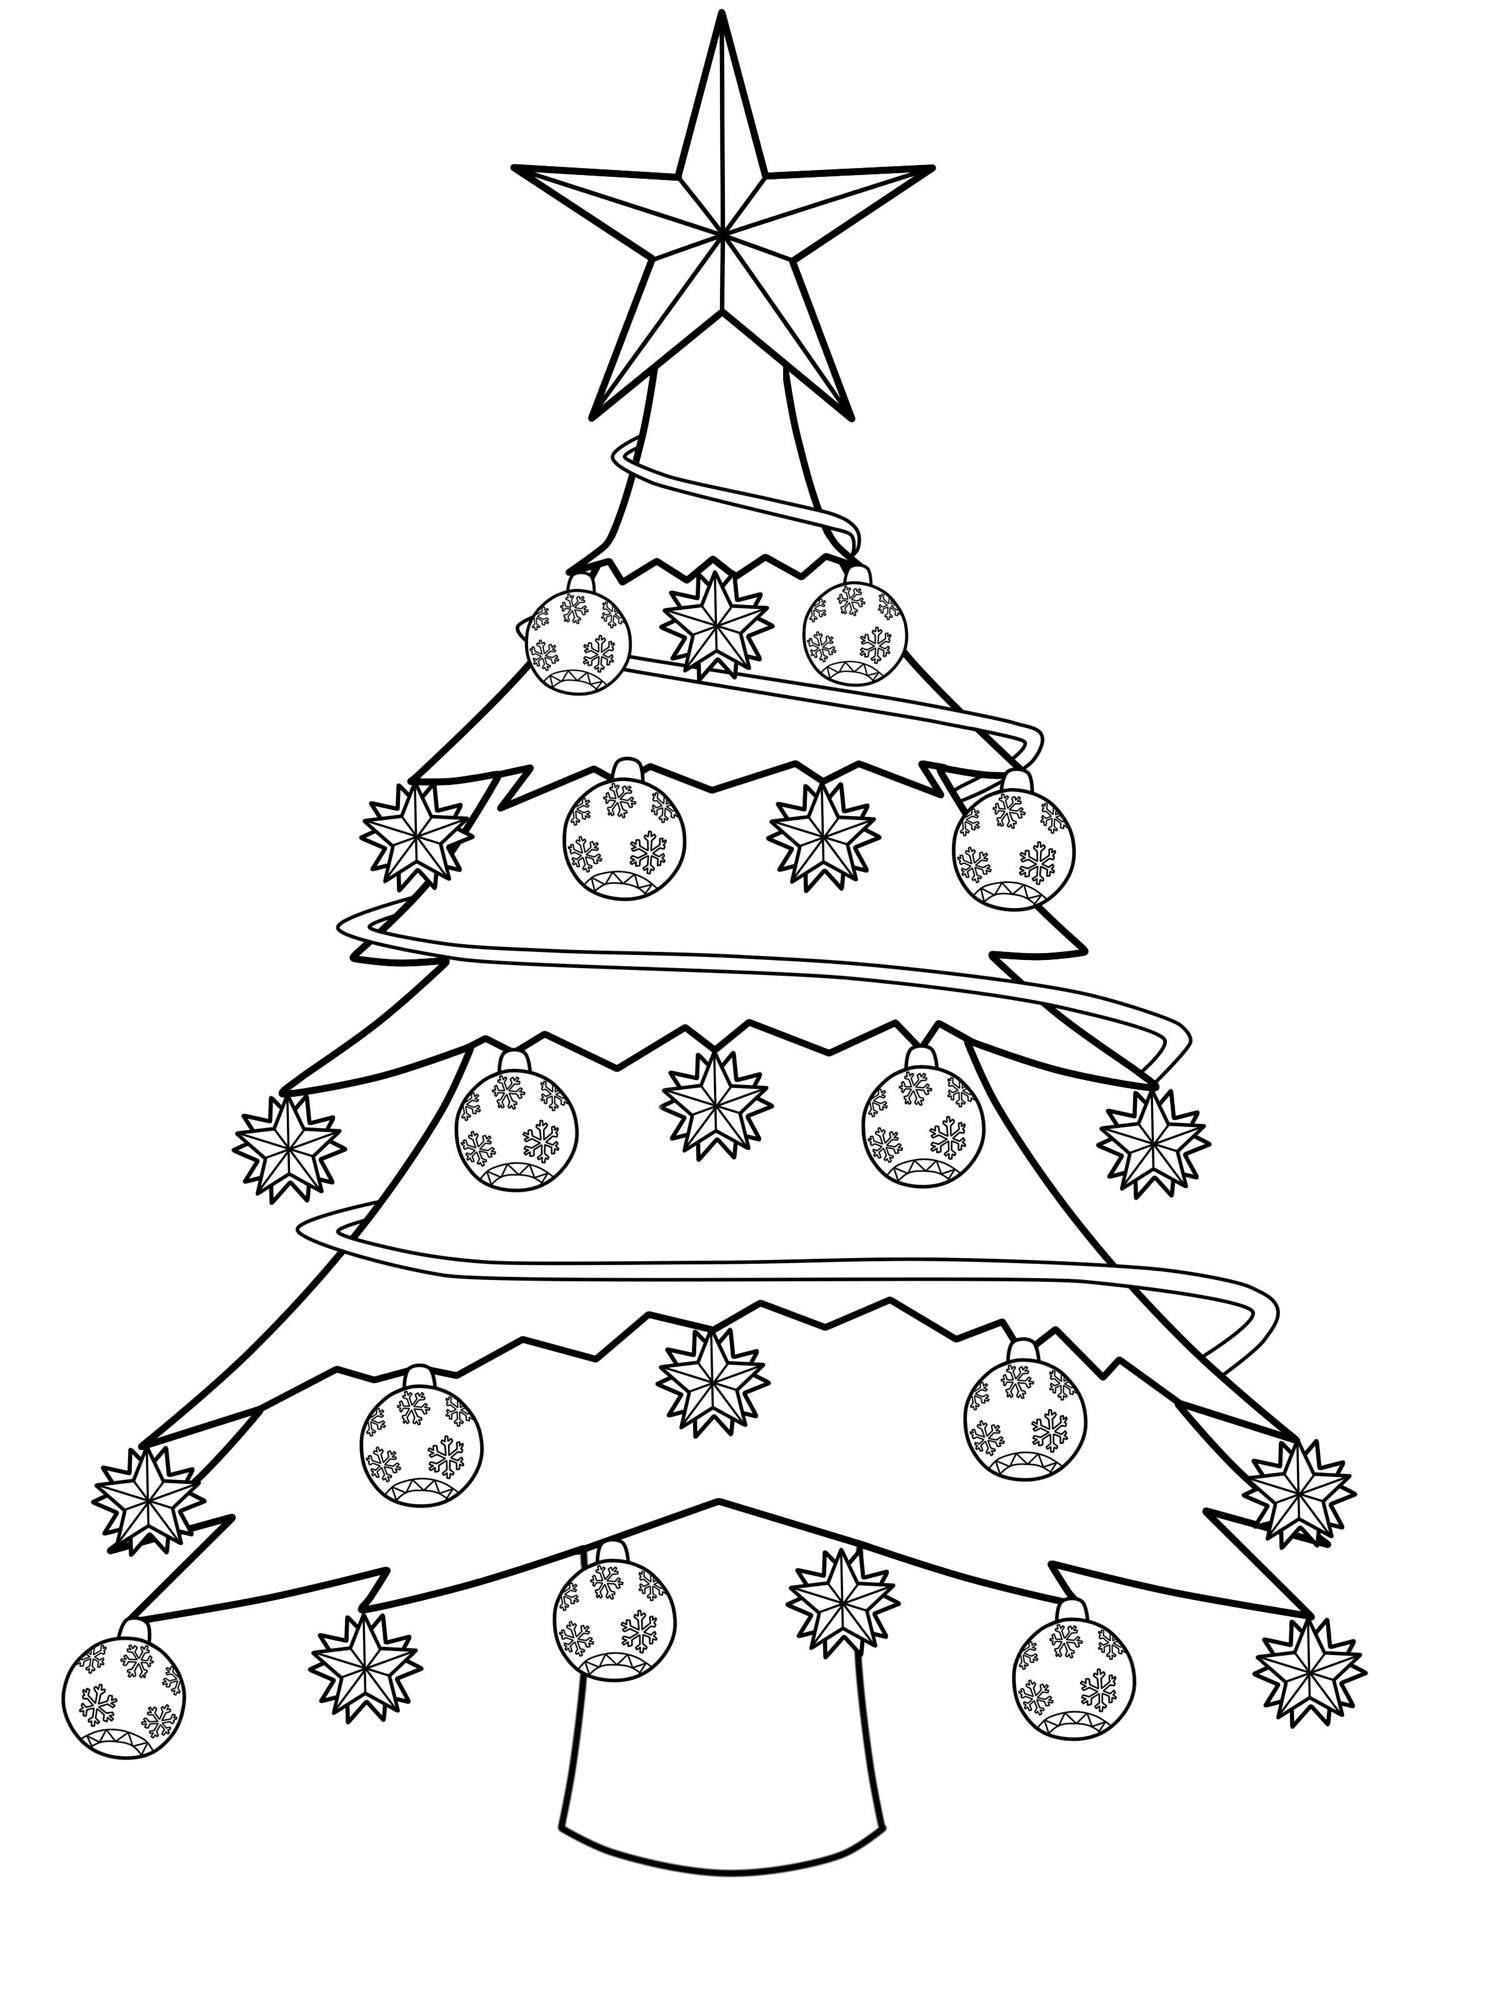 weihnachtsbaum malen  weihnachtsbaum malen ausmalbilder